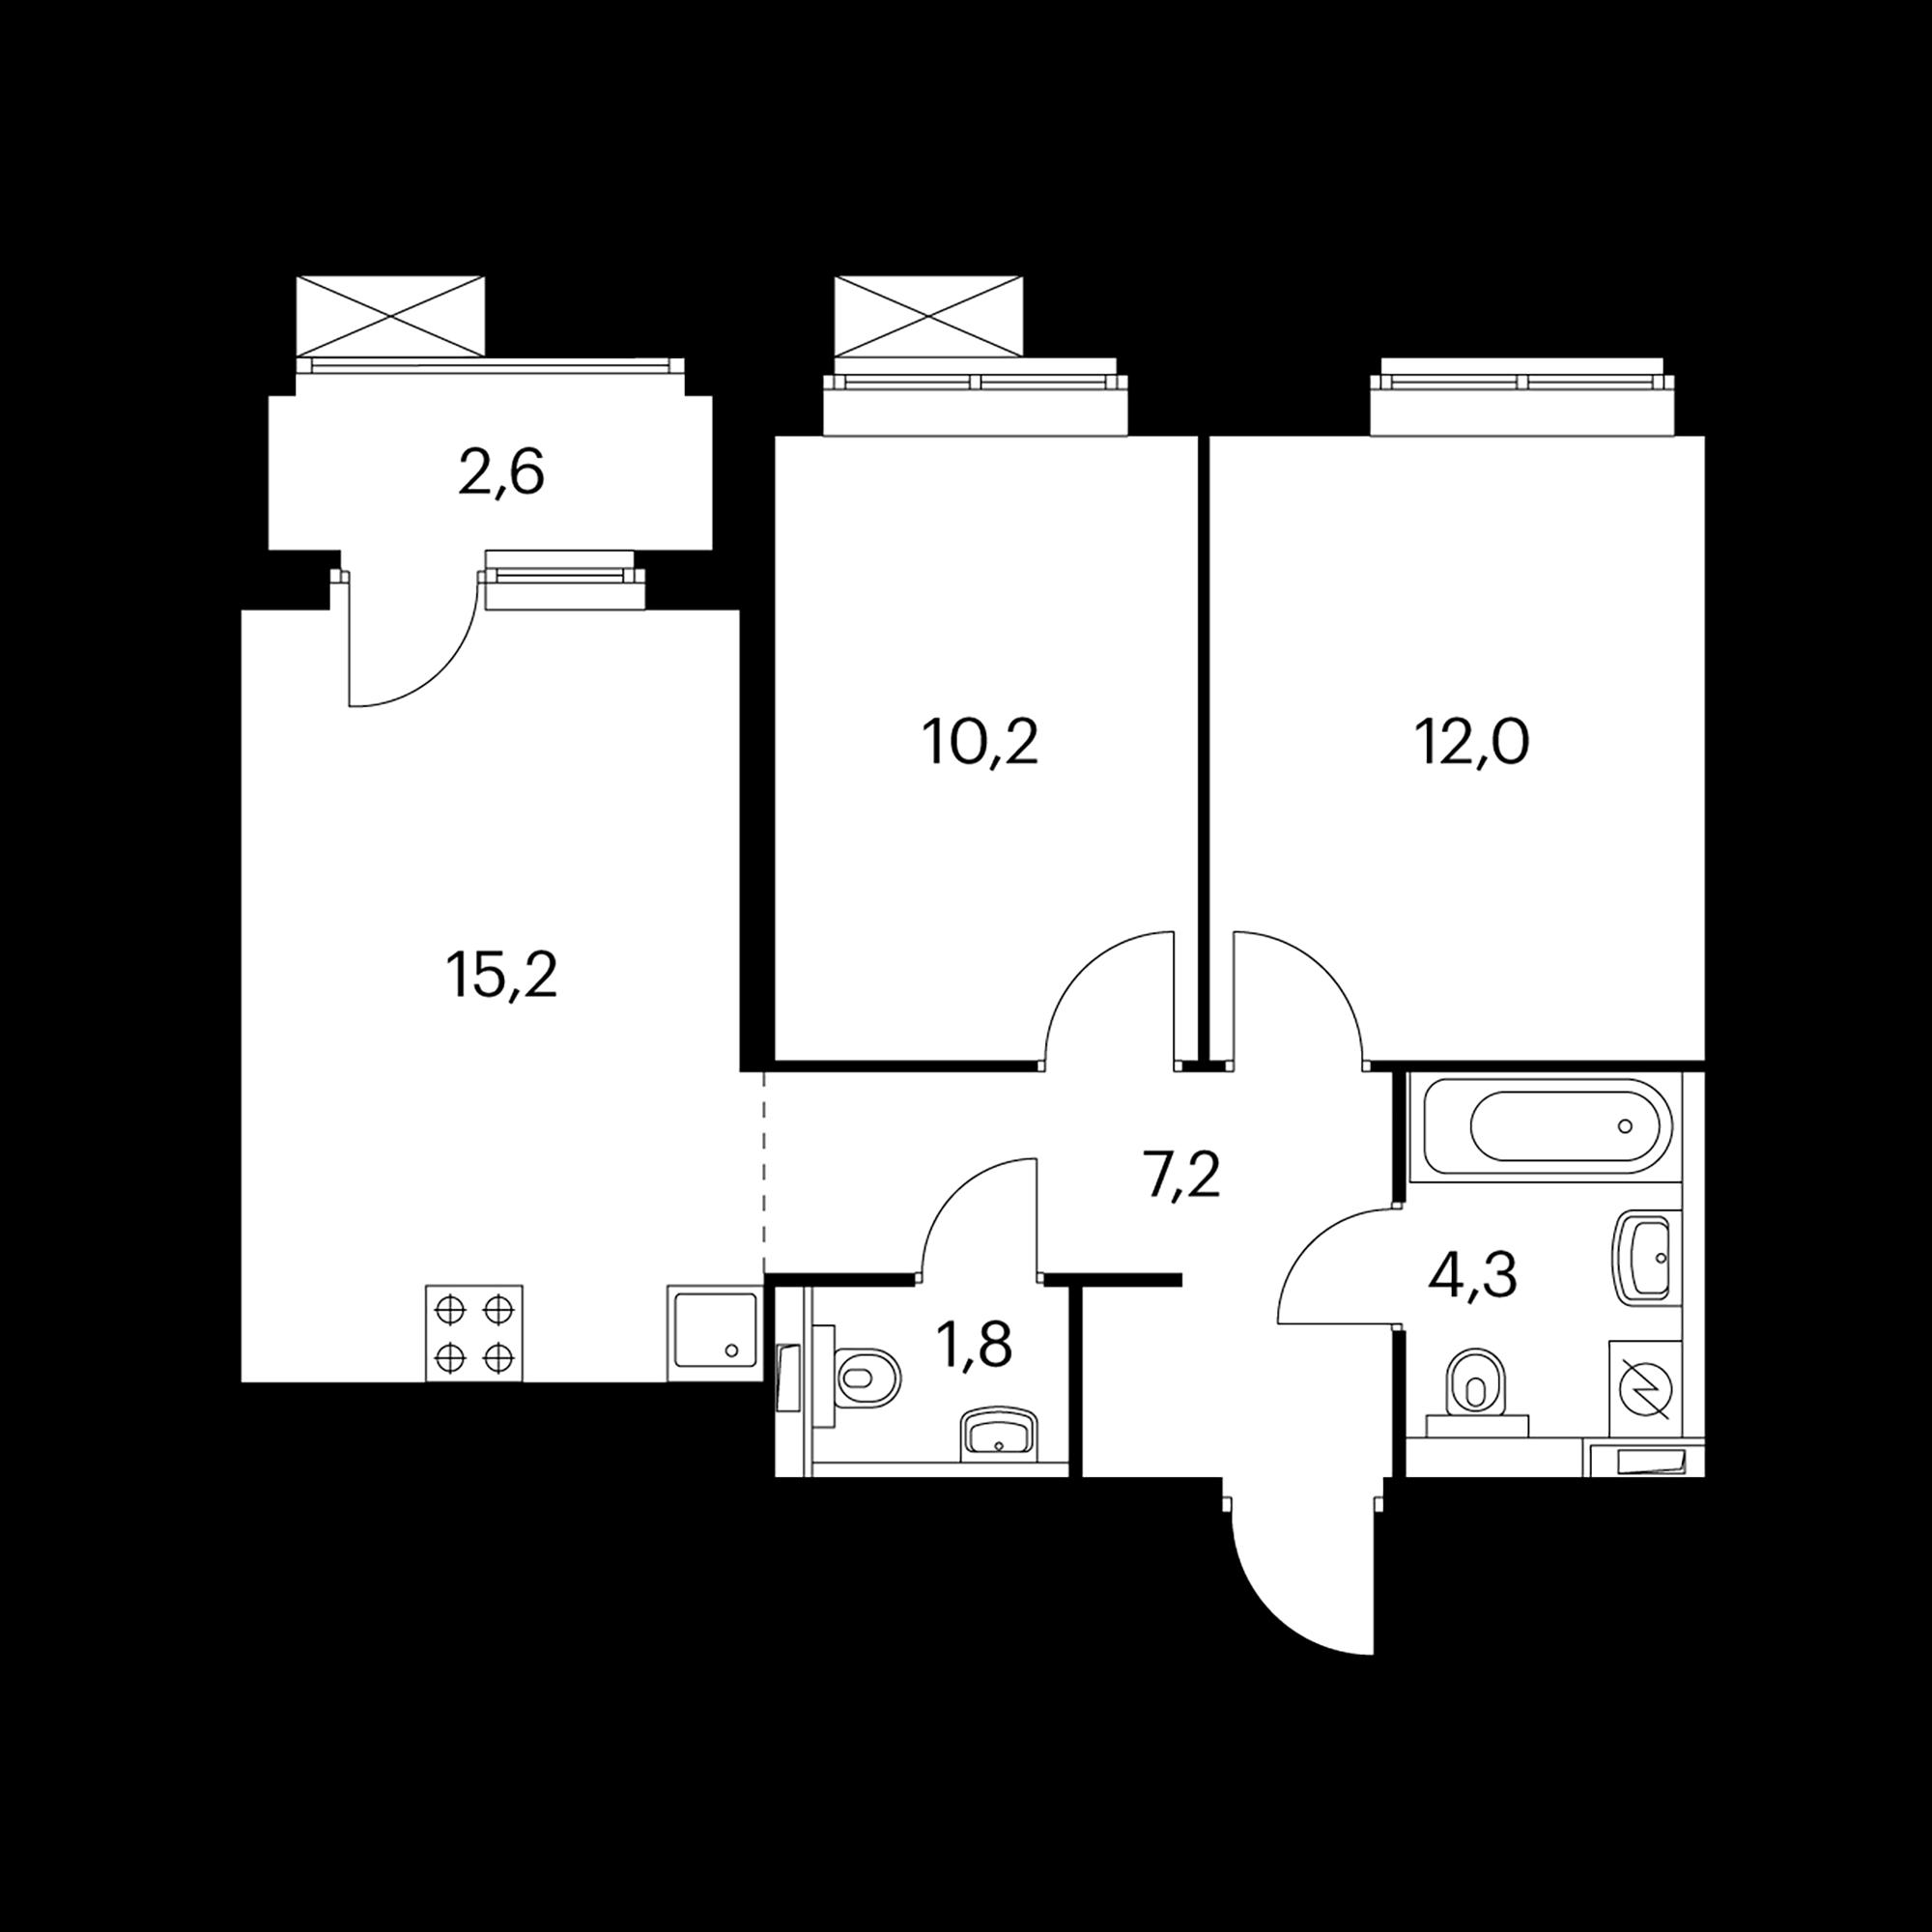 2ES8_9.3-2